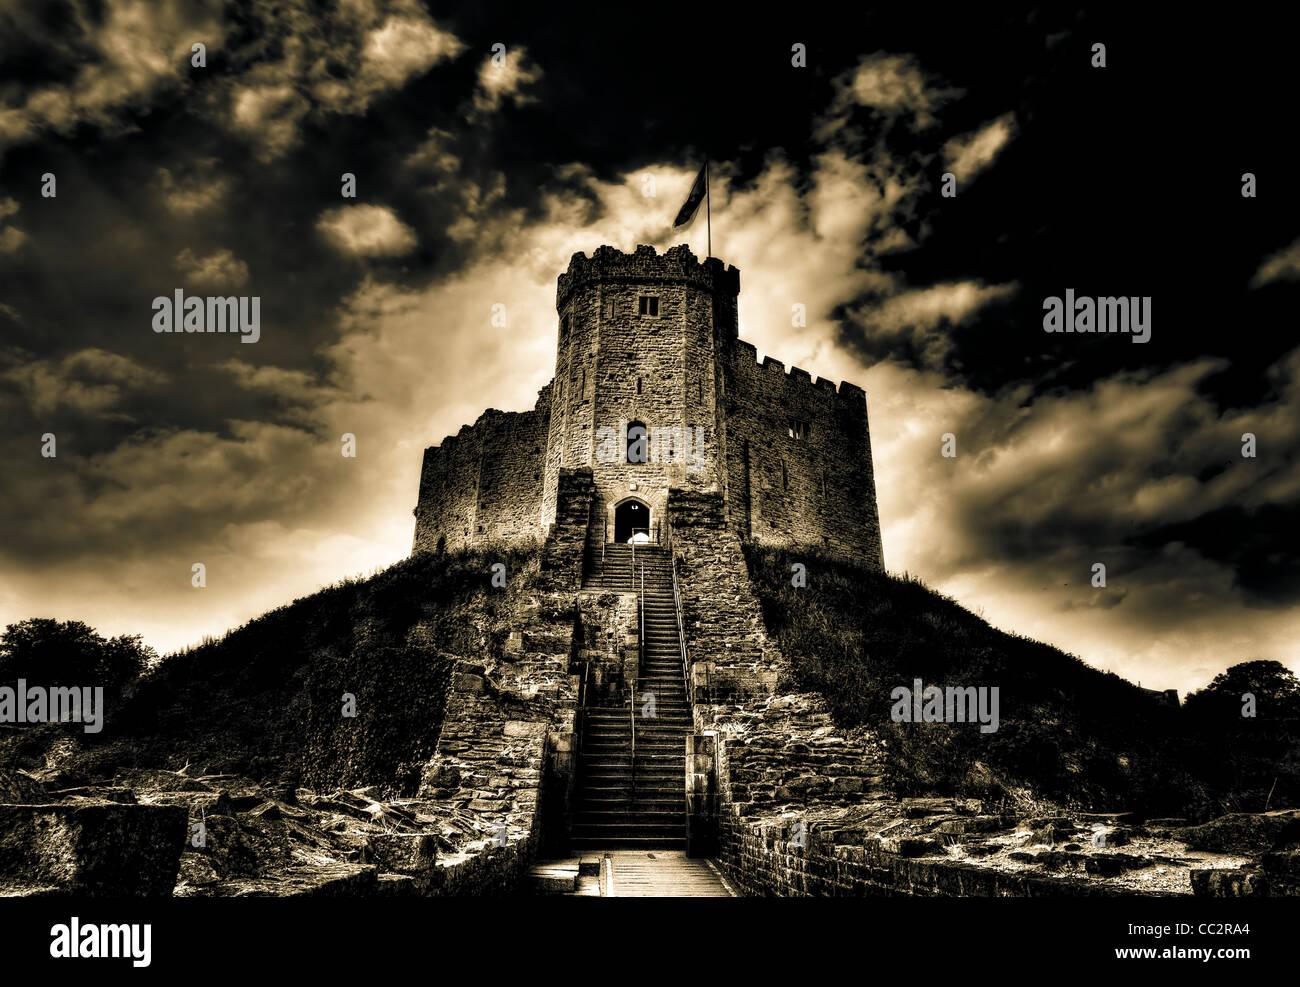 Dramatic shot of Cardiff Castle - Stock Image